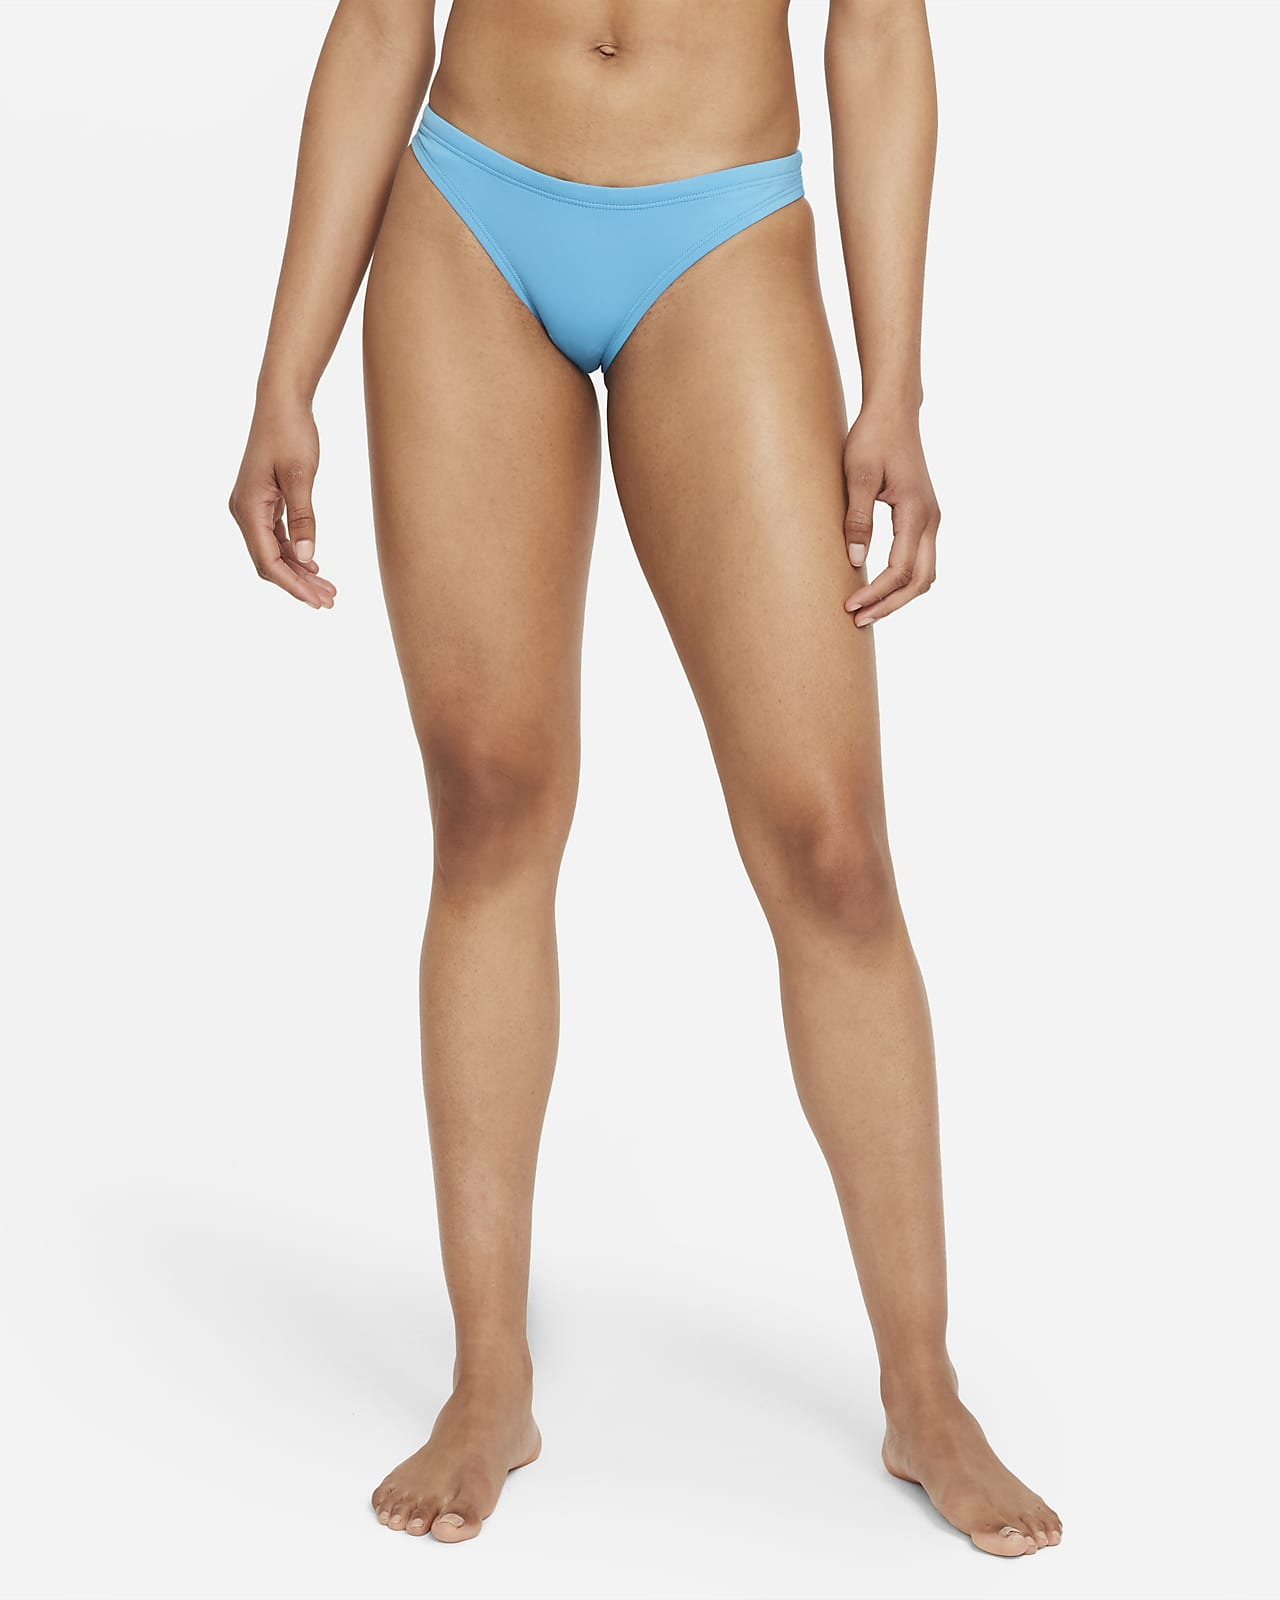 Nike Bikini Women's Swim Bottoms